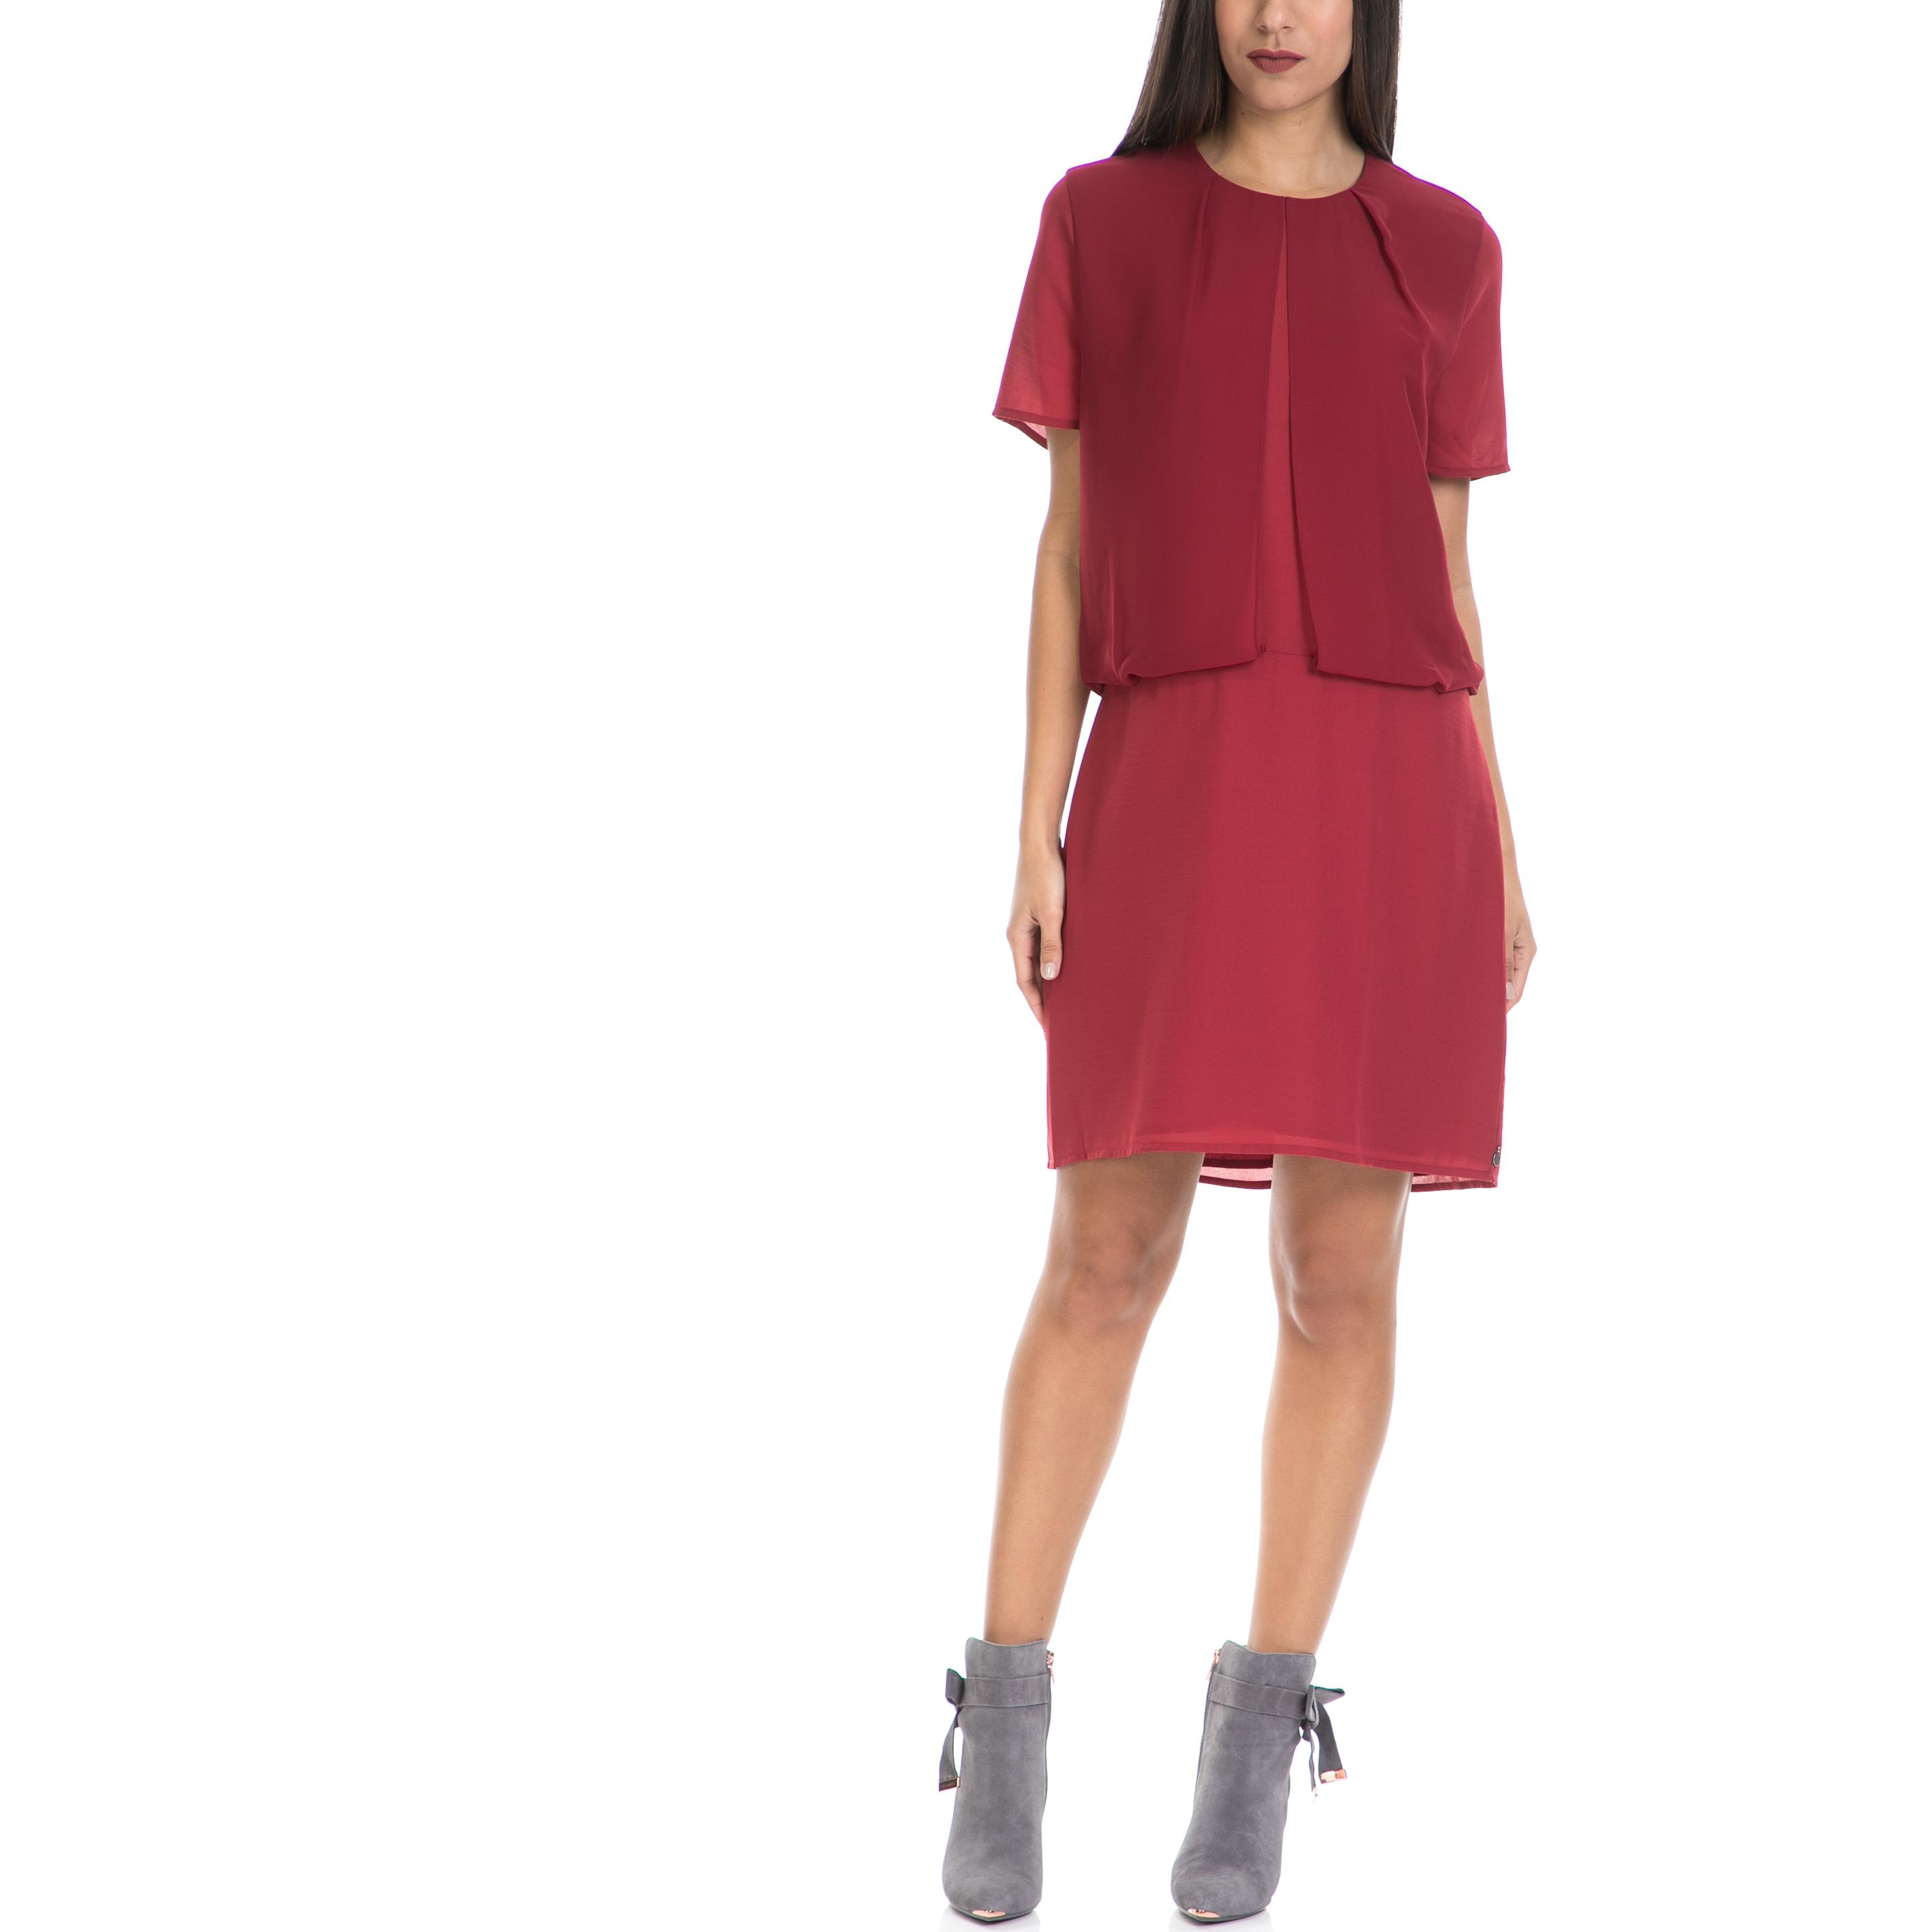 SCOTCH & SODA - Γυναικείο φόρεμα MAISON SCOTCH κόκκινο γυναικεία ρούχα φορέματα μίνι